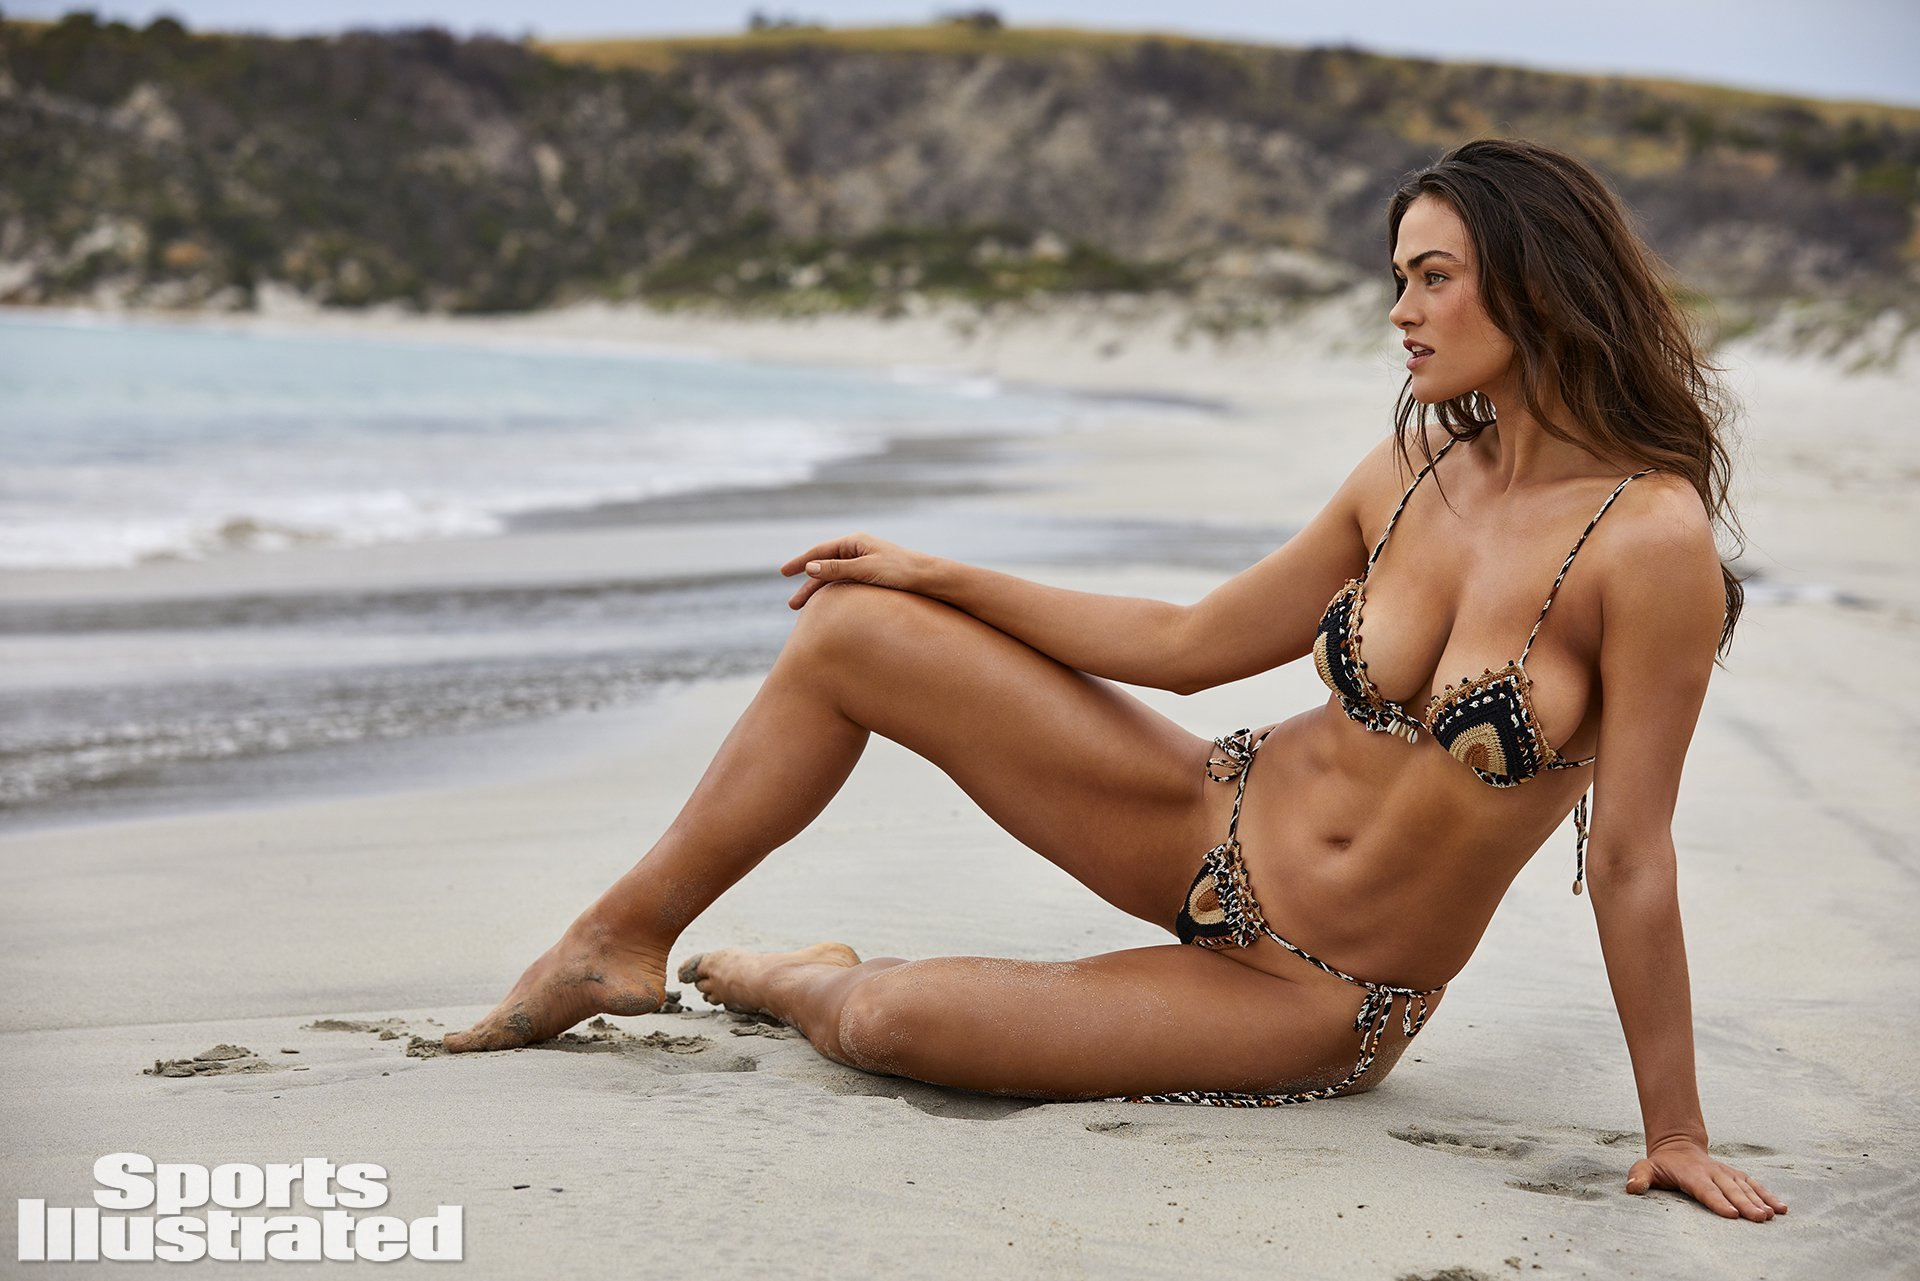 Myla Dalbesio - Sports Illustrated Swimsuit 2019